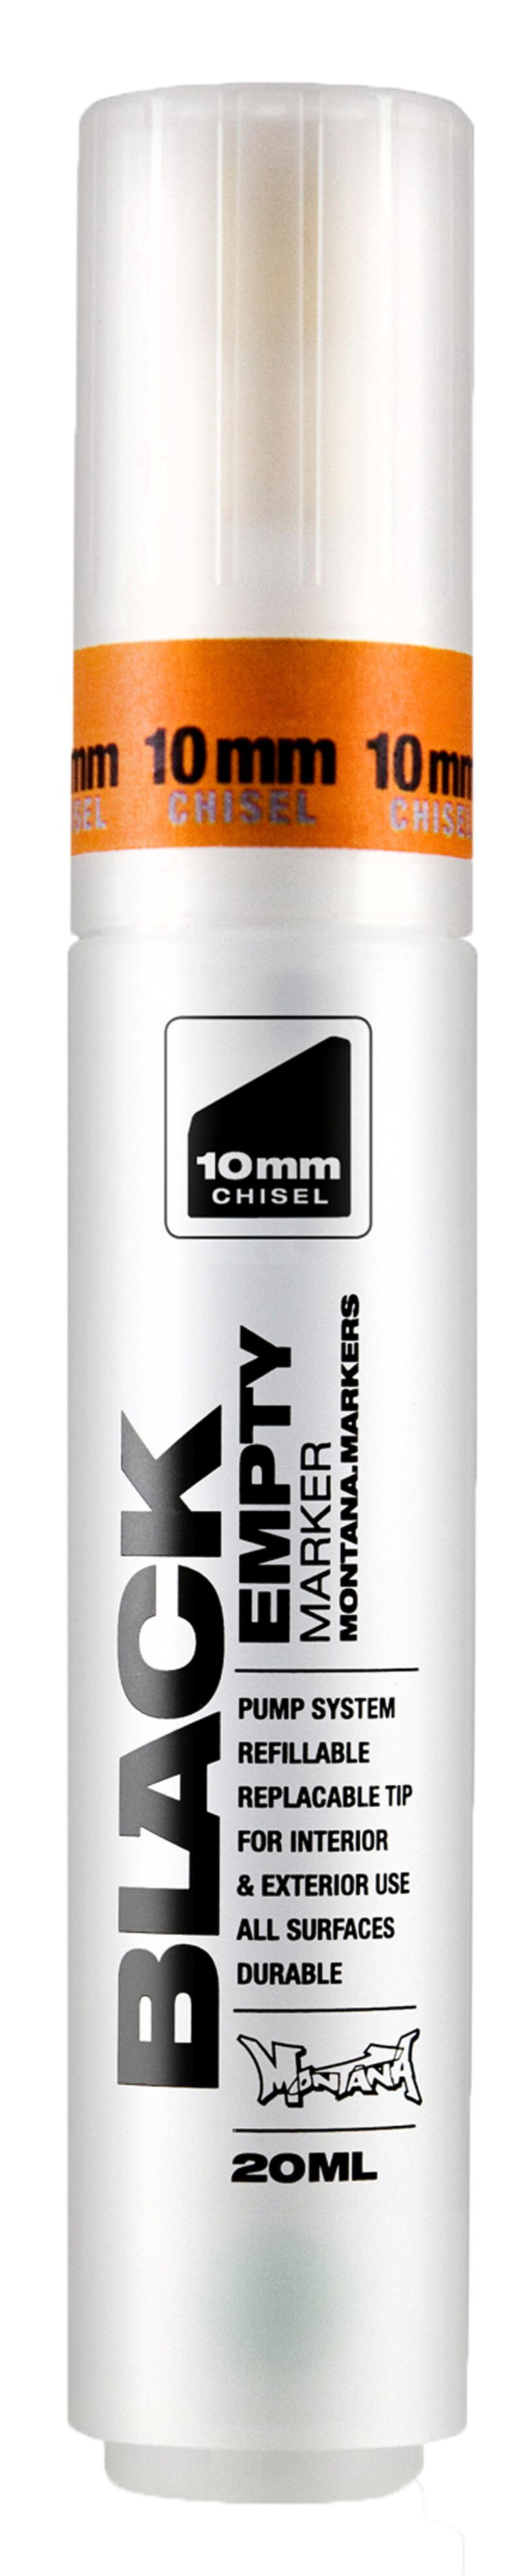 Black 10 mm Chisel